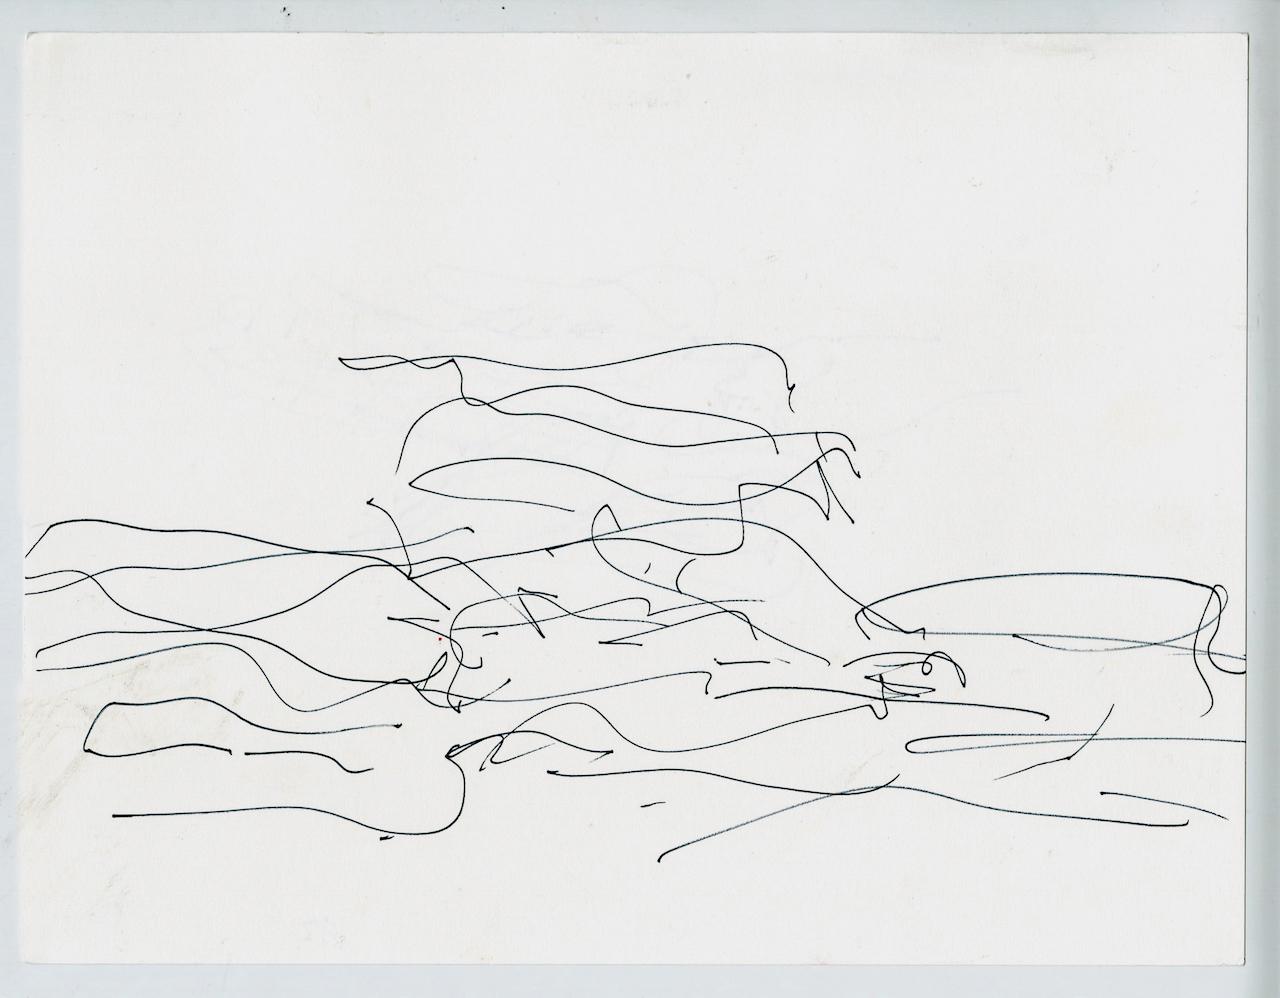 Frank Gehry, design sketch and volume study of Quanzhou Museum of Contemporary Art (2012)